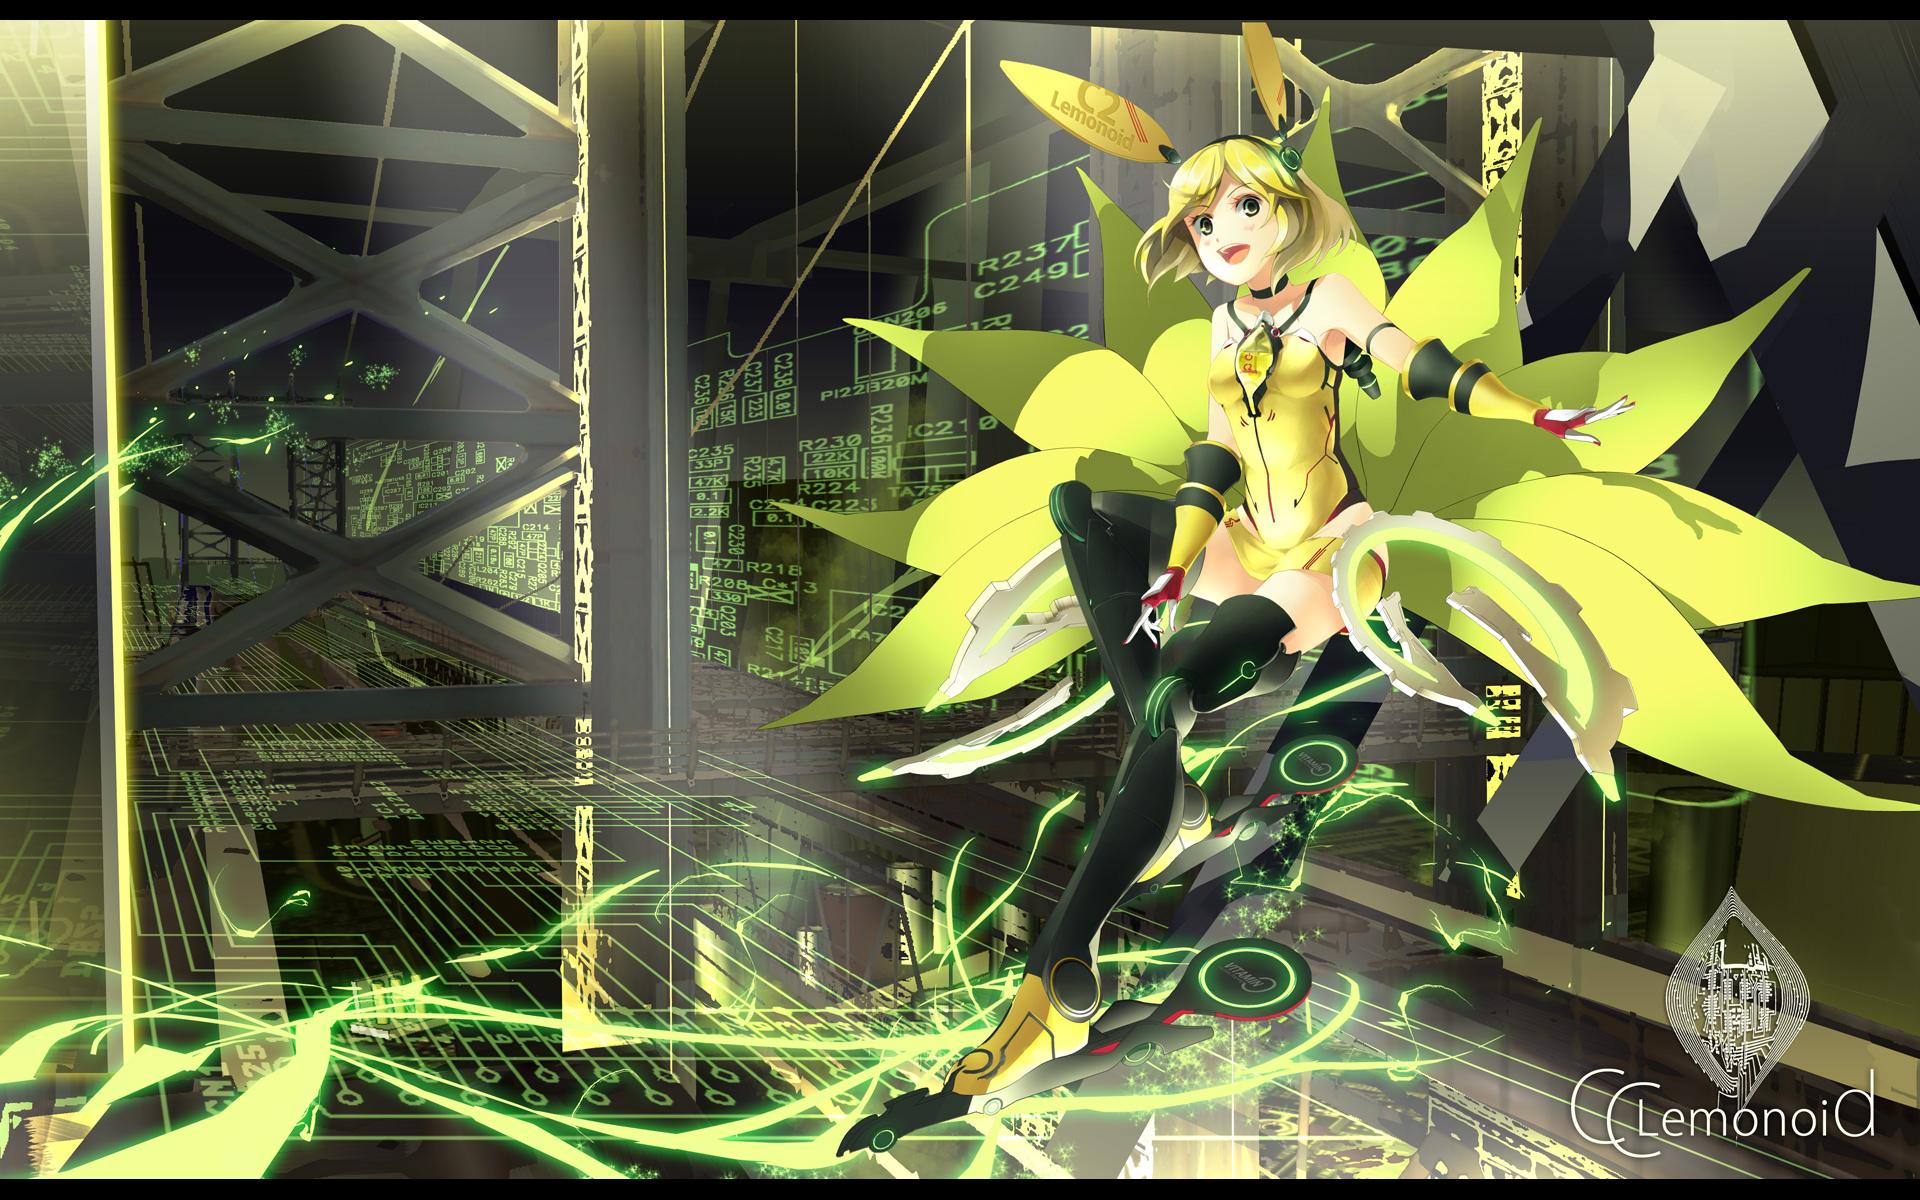 c c lemon character yoshino ryou wallpaper 1920x1200 78363 wallpaperup